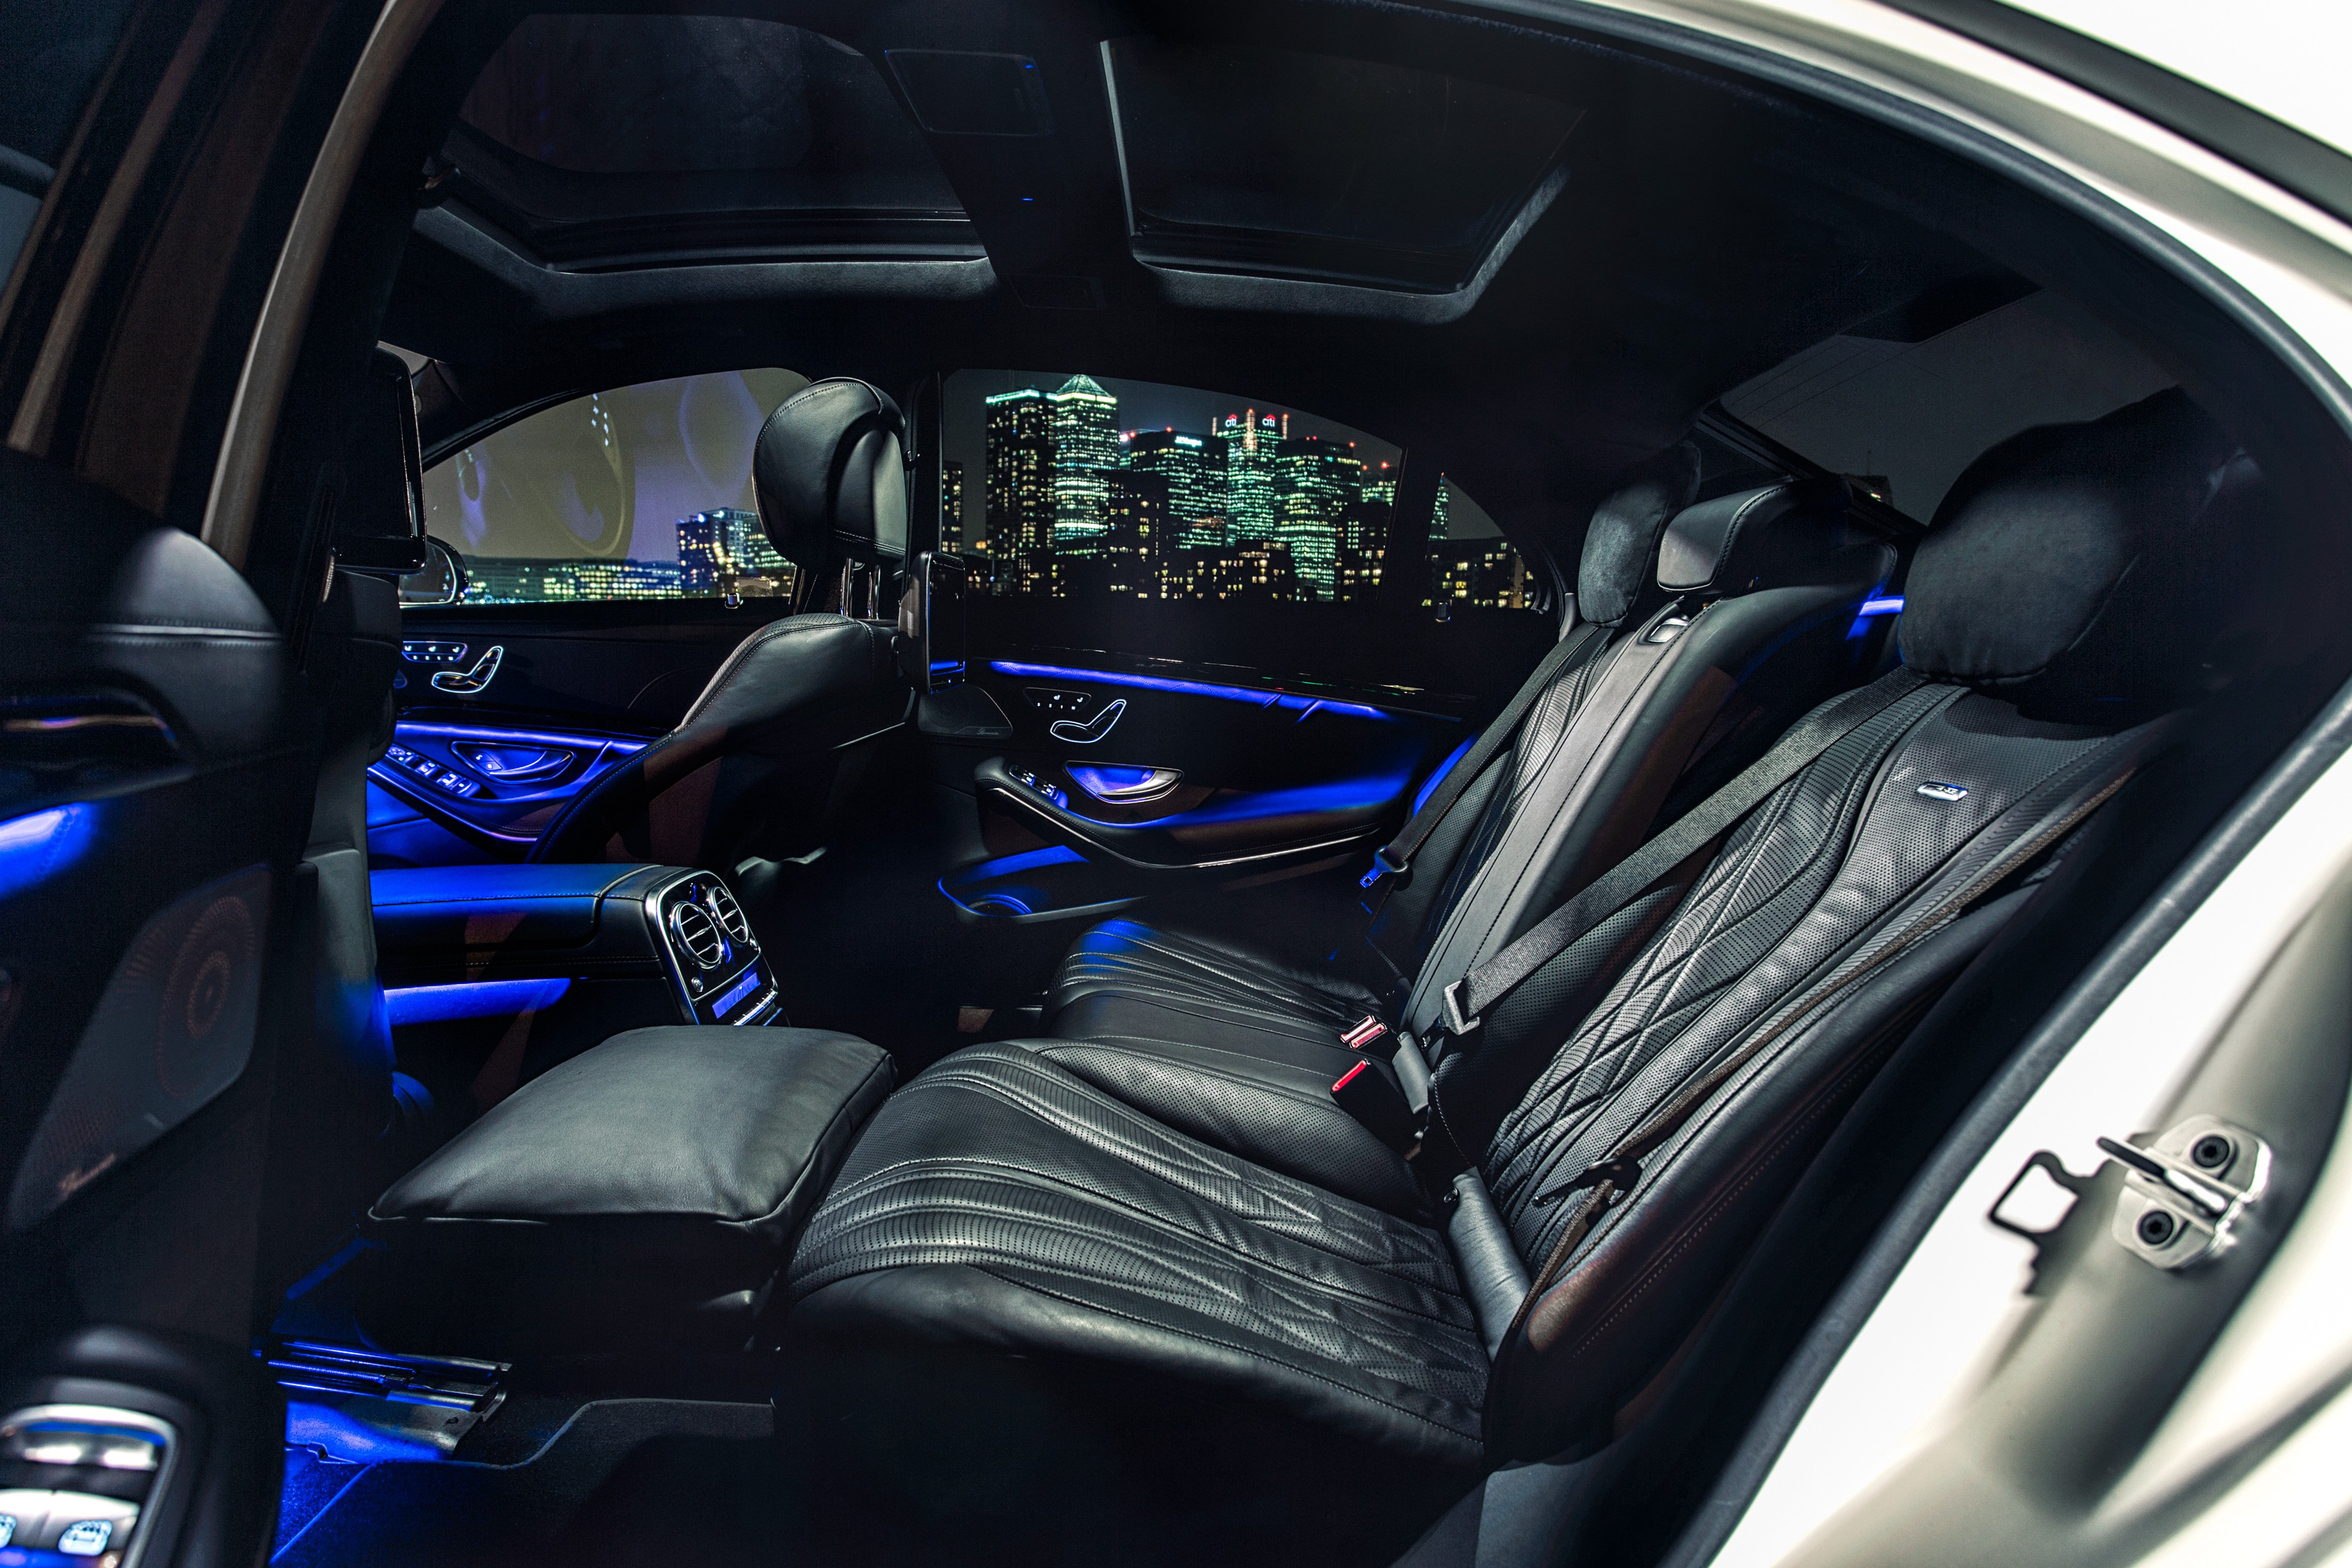 mercedes benz s 63 amg w222 specs 2013 2014 2015 2016 2017 autoevolution. Black Bedroom Furniture Sets. Home Design Ideas